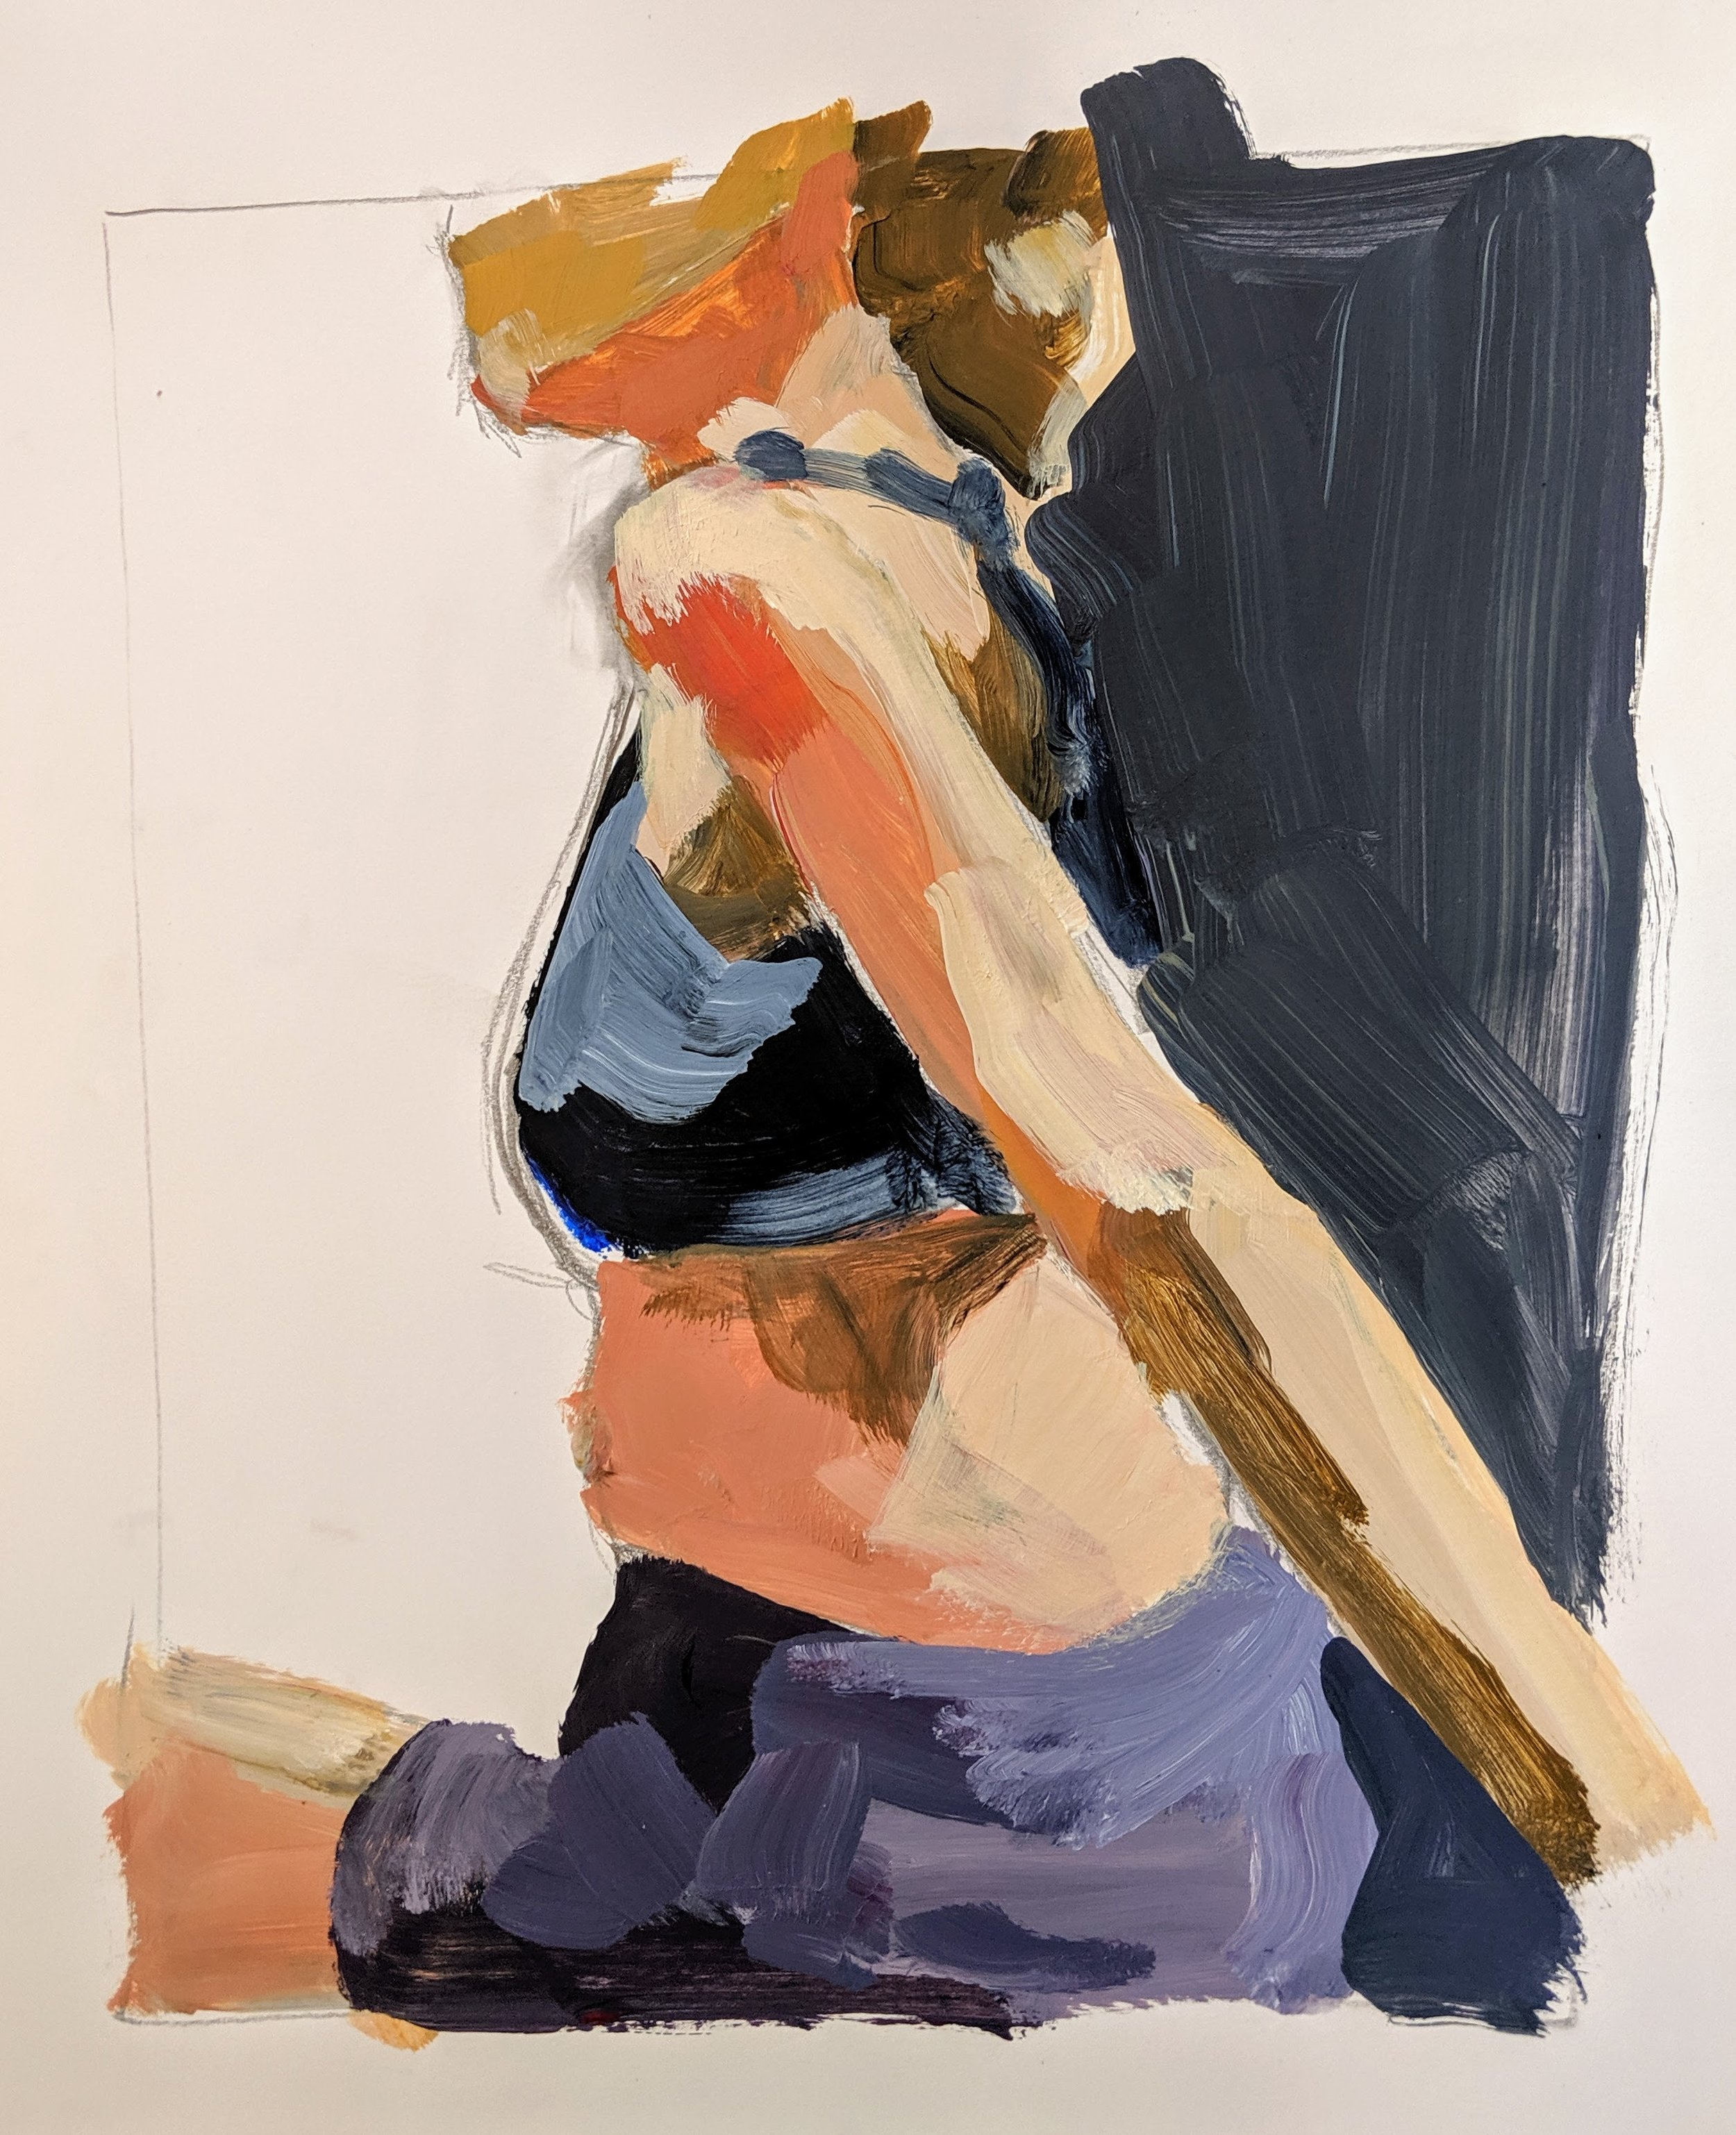 ©2019 Jane Feil  | Figure Painting & Drawing Workshop, San Luis Obispo County (Arroyo Grande, CA) | David Limrite, Instructor